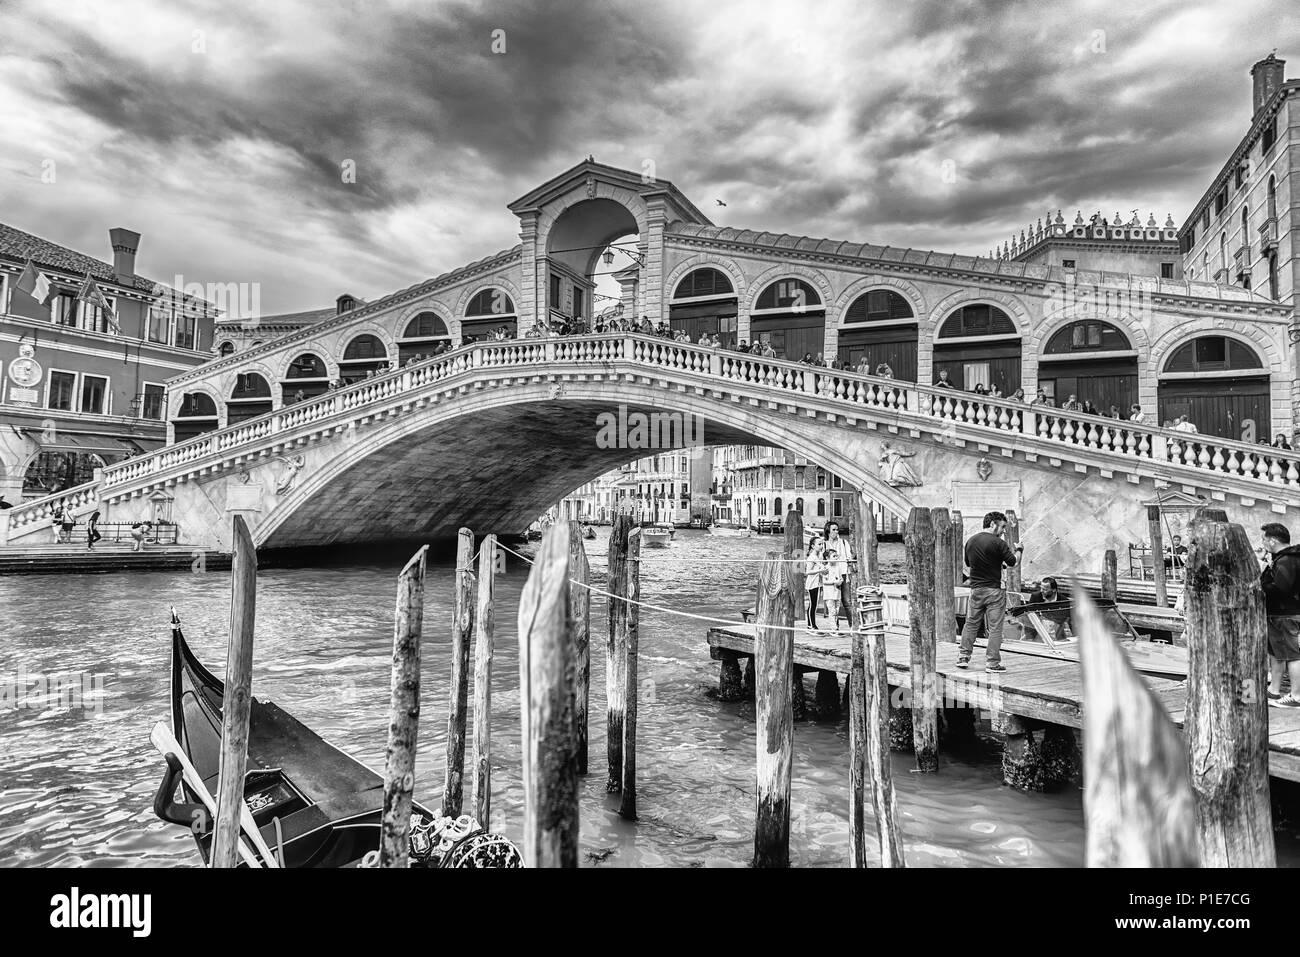 Venice italy april 29 view of rialto bridge iconic landmark in venice